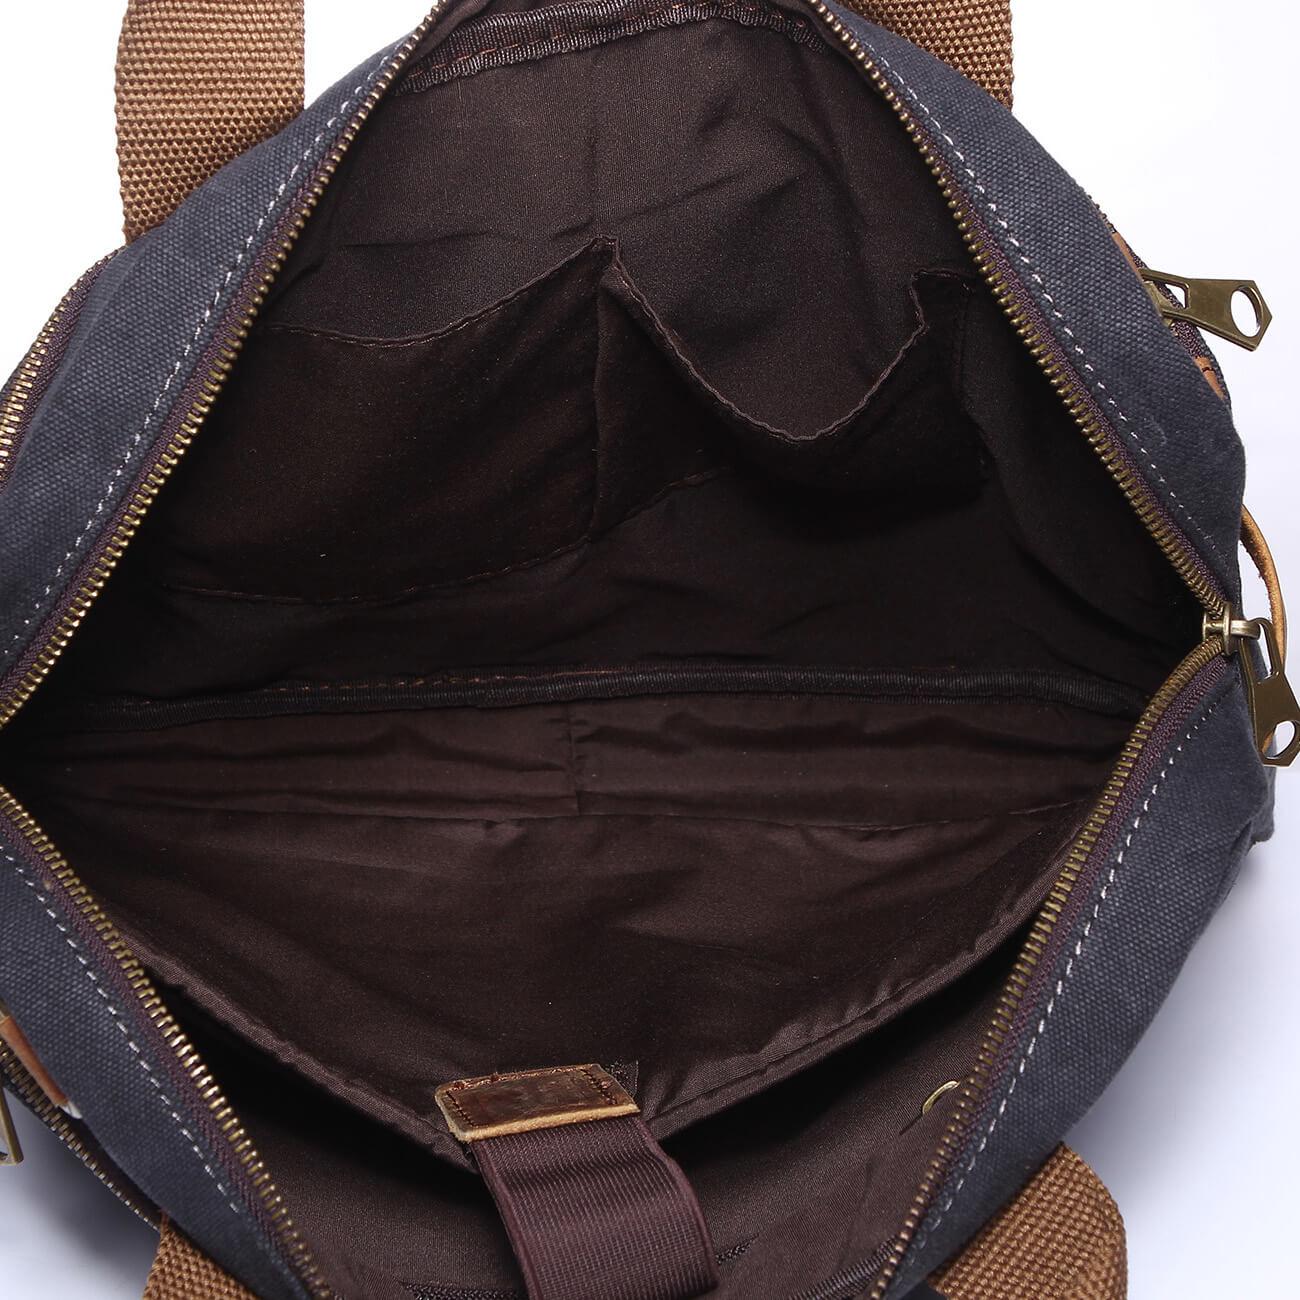 ffdf40bedbe8 Heavy Cotton Canvas Laptop Bag Tote Business Bag Men Shoulder Bag Briefcase